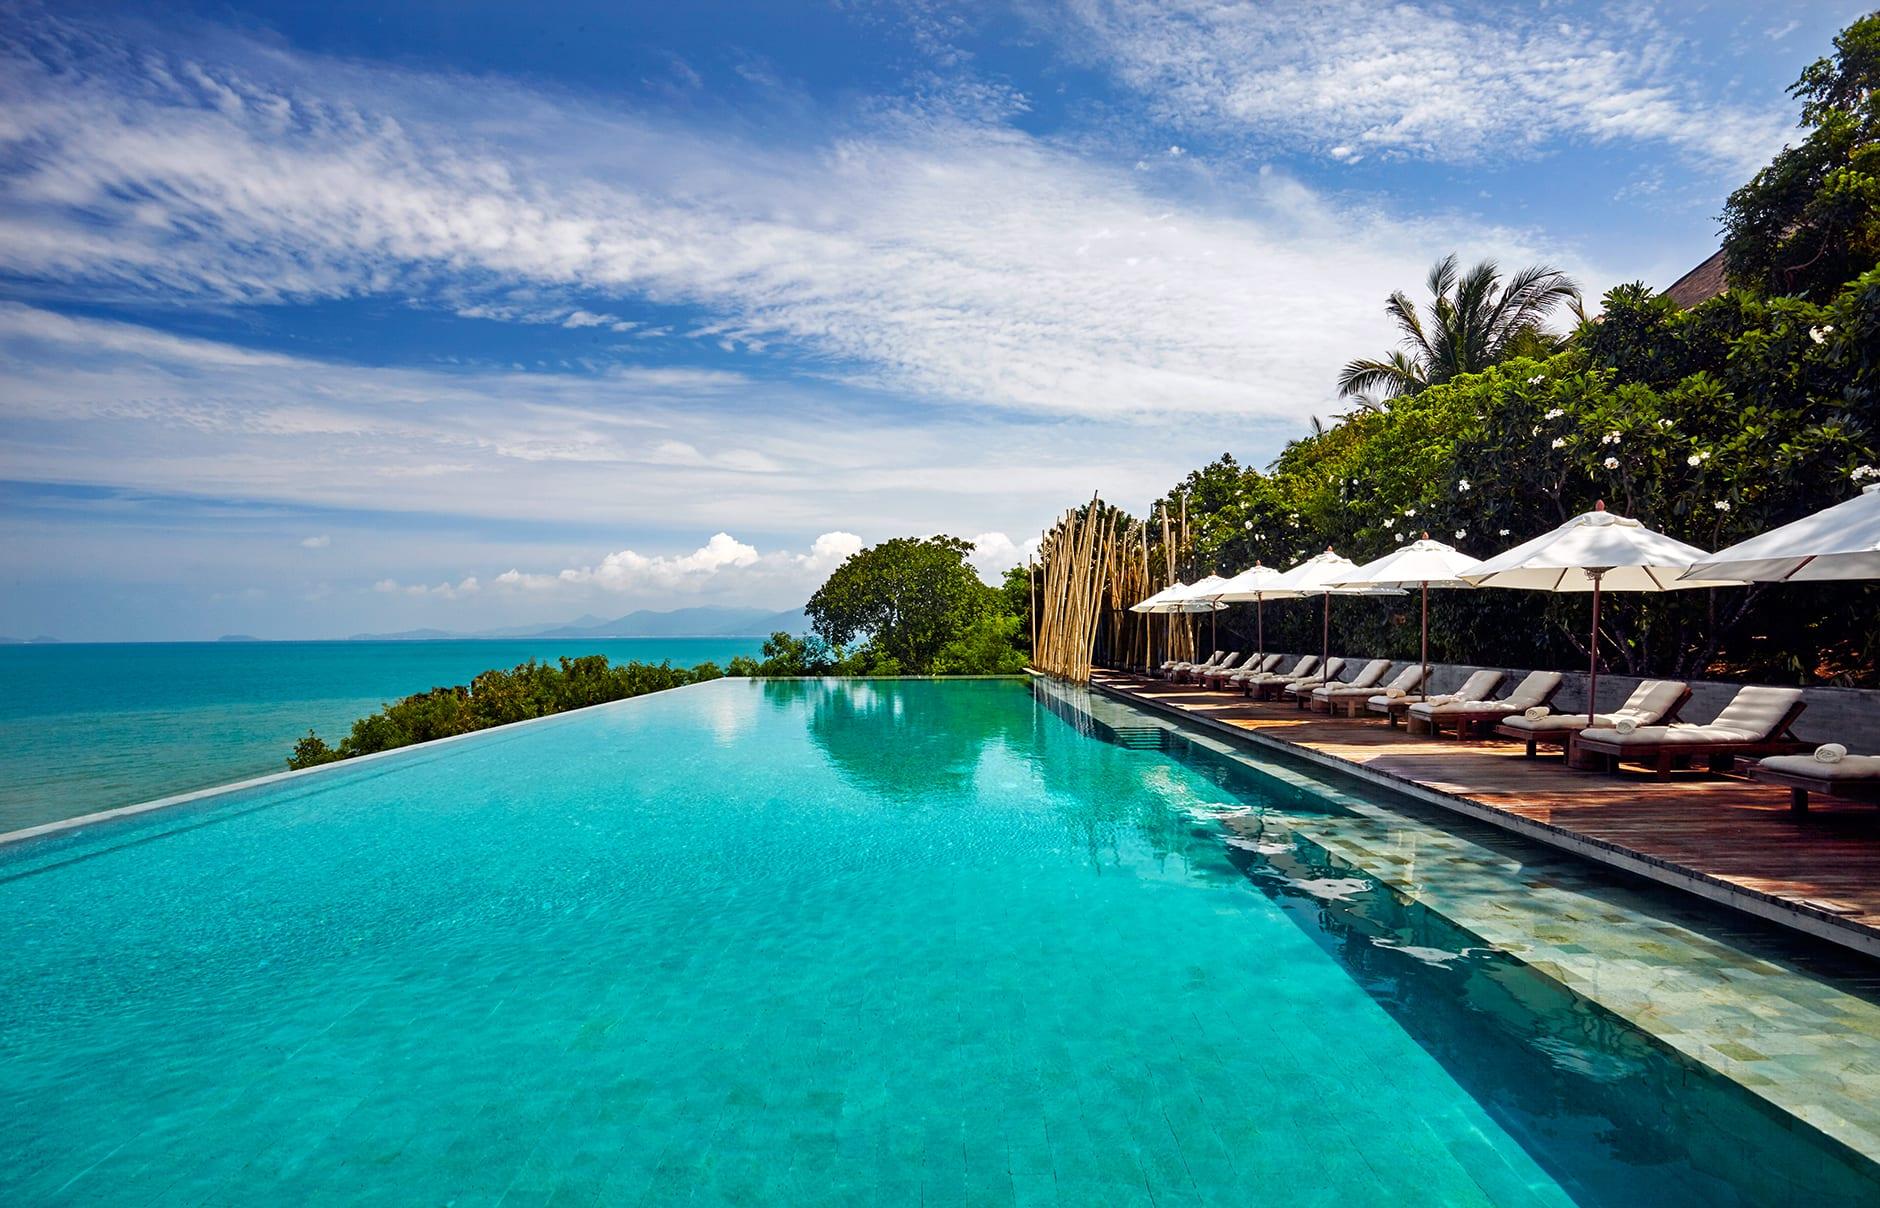 Main pool. Six Senses Samui, Thailand. © Six Senses Resorts & Spas